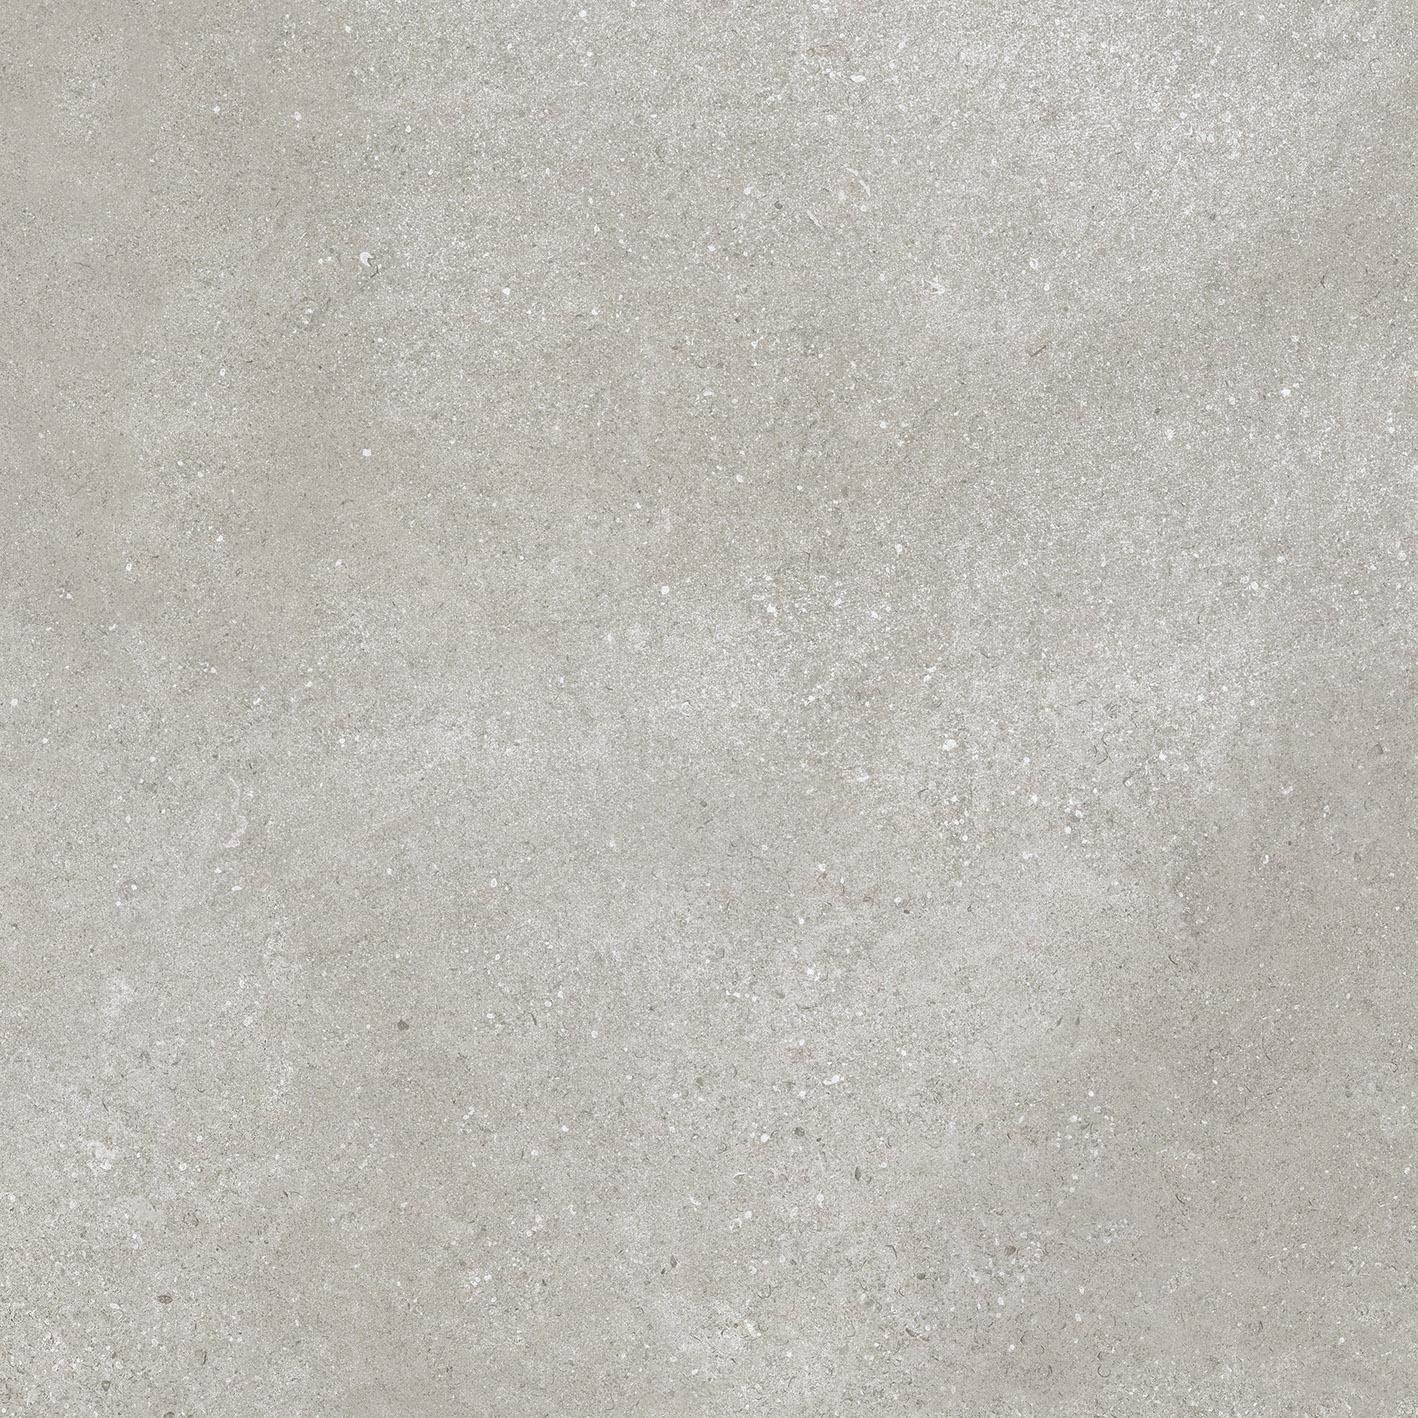 Hudson ash grey 2577-SD5B R10/A rect. 60x60x1 II sort - Hansas Plaadimaailm